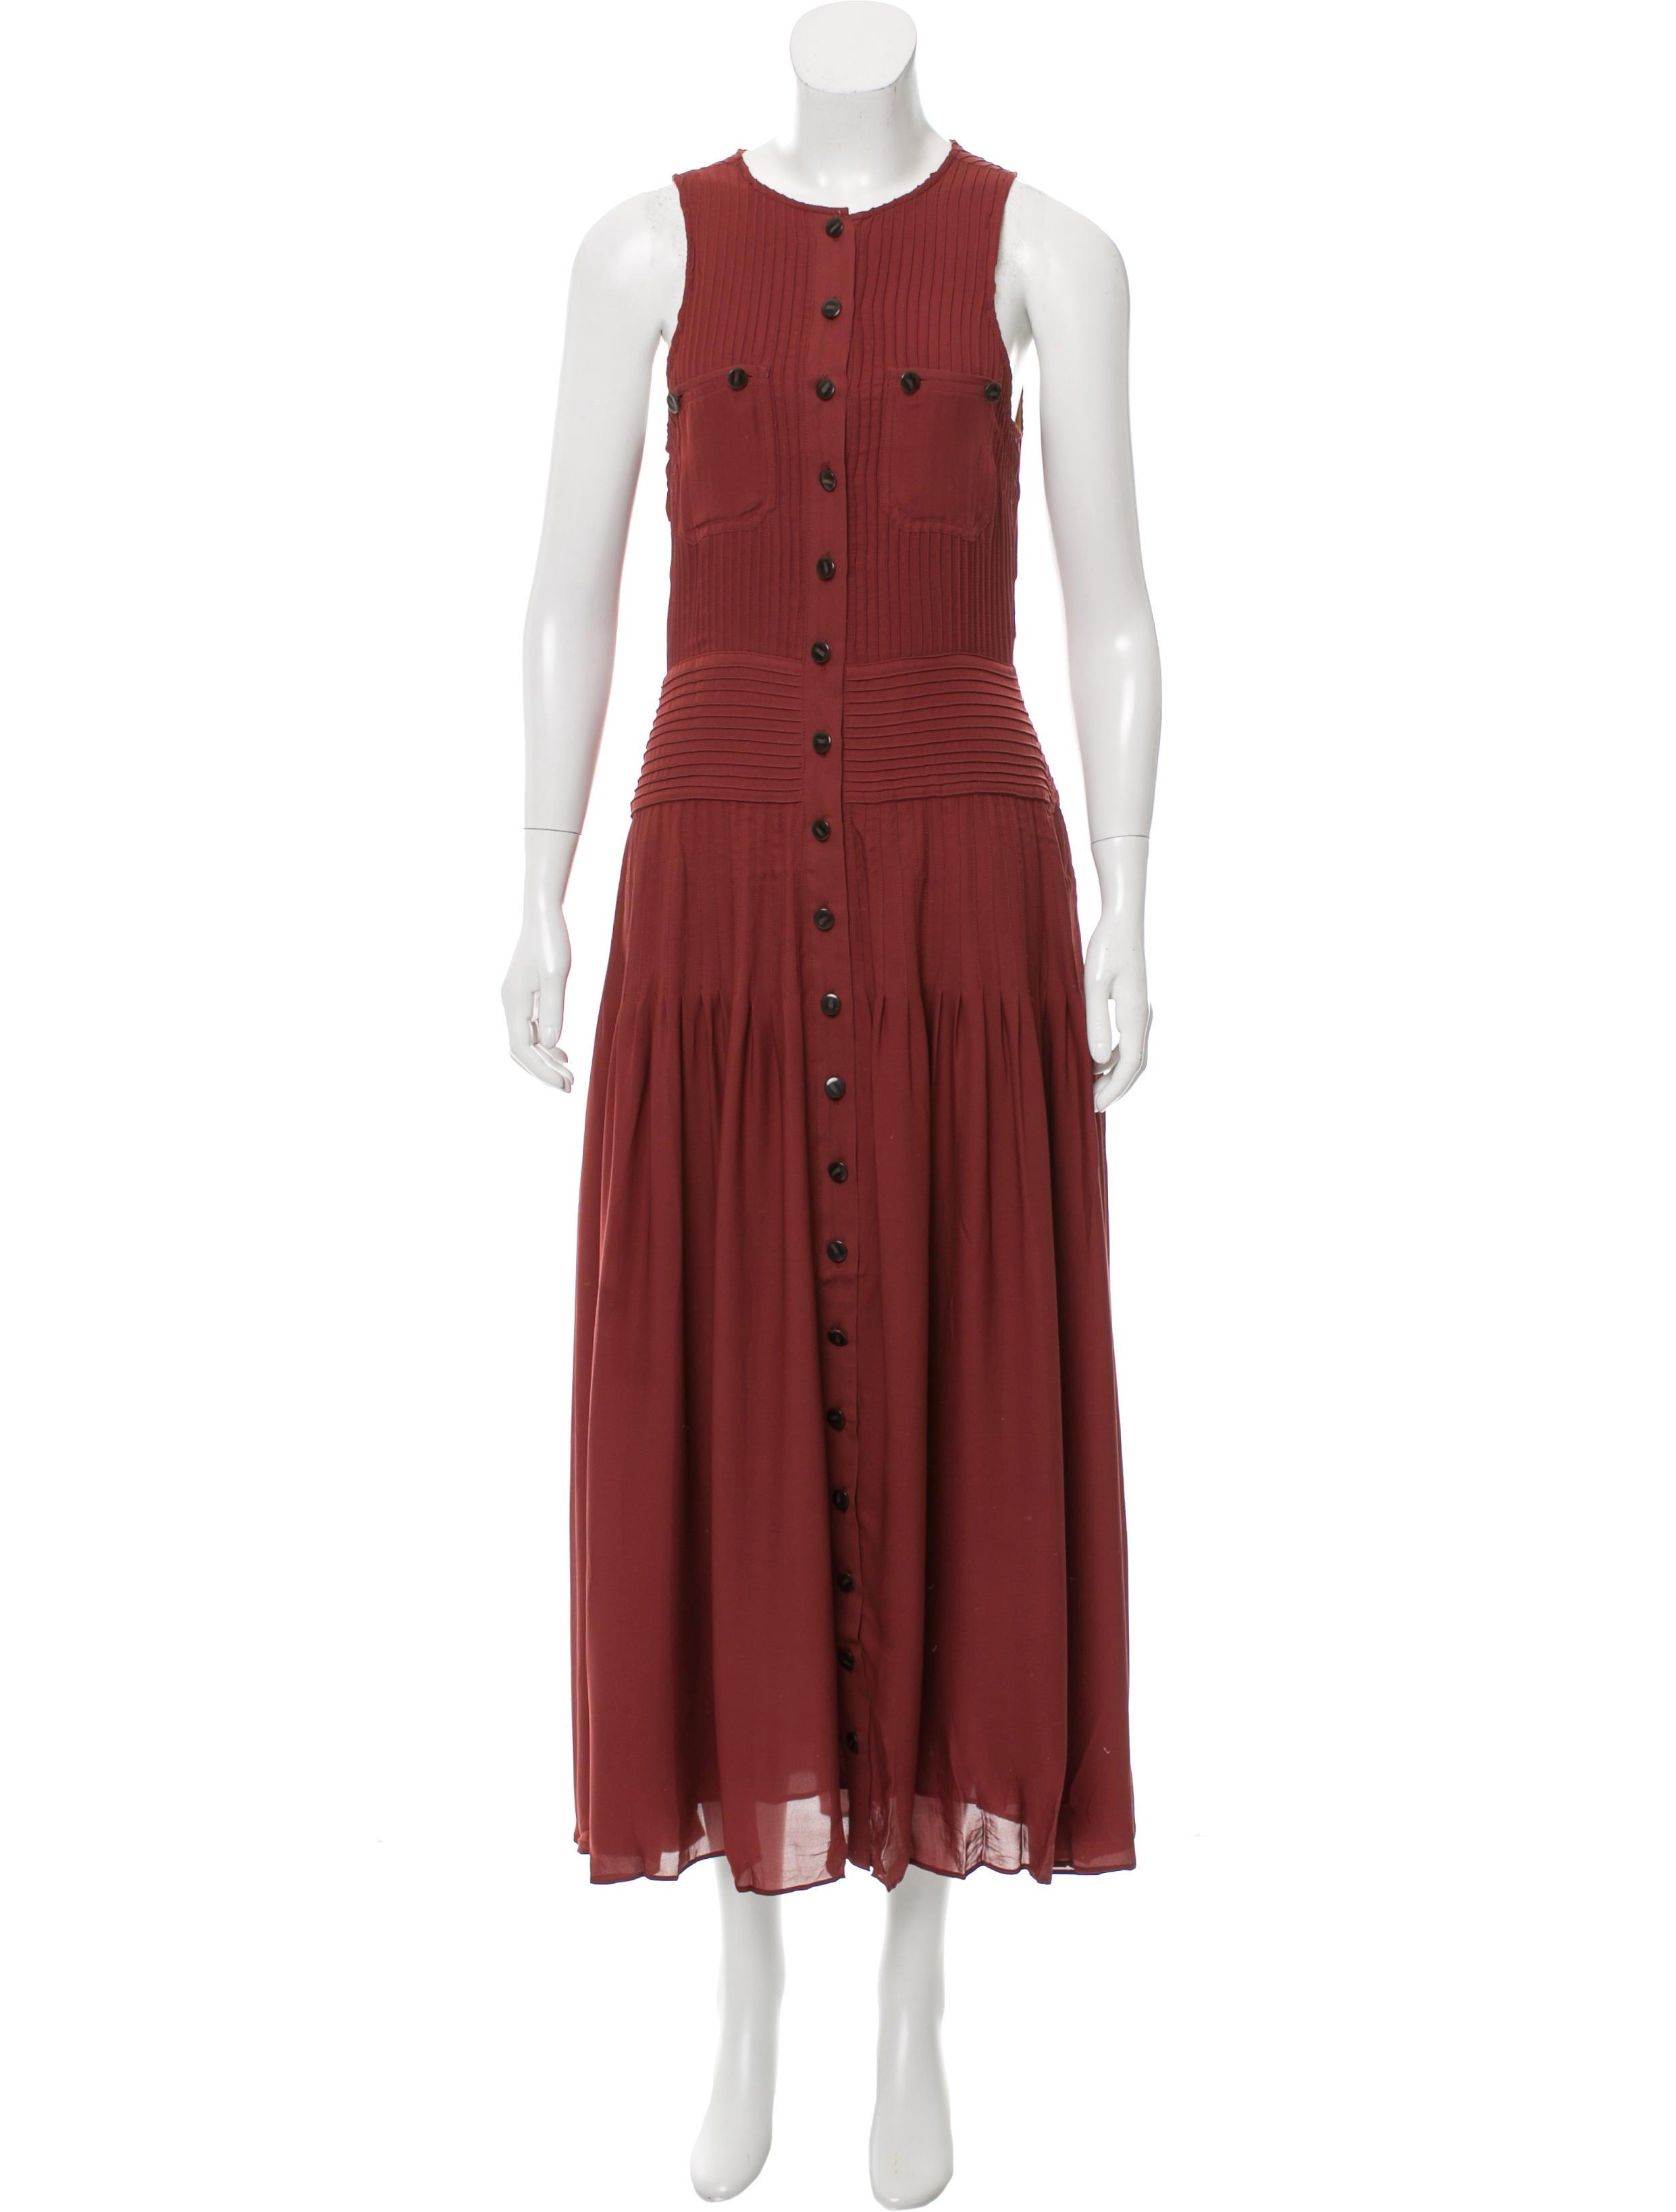 Release Dates For Sale Hanley Mellon Silk Mini Dress Top Quality nObfNd9